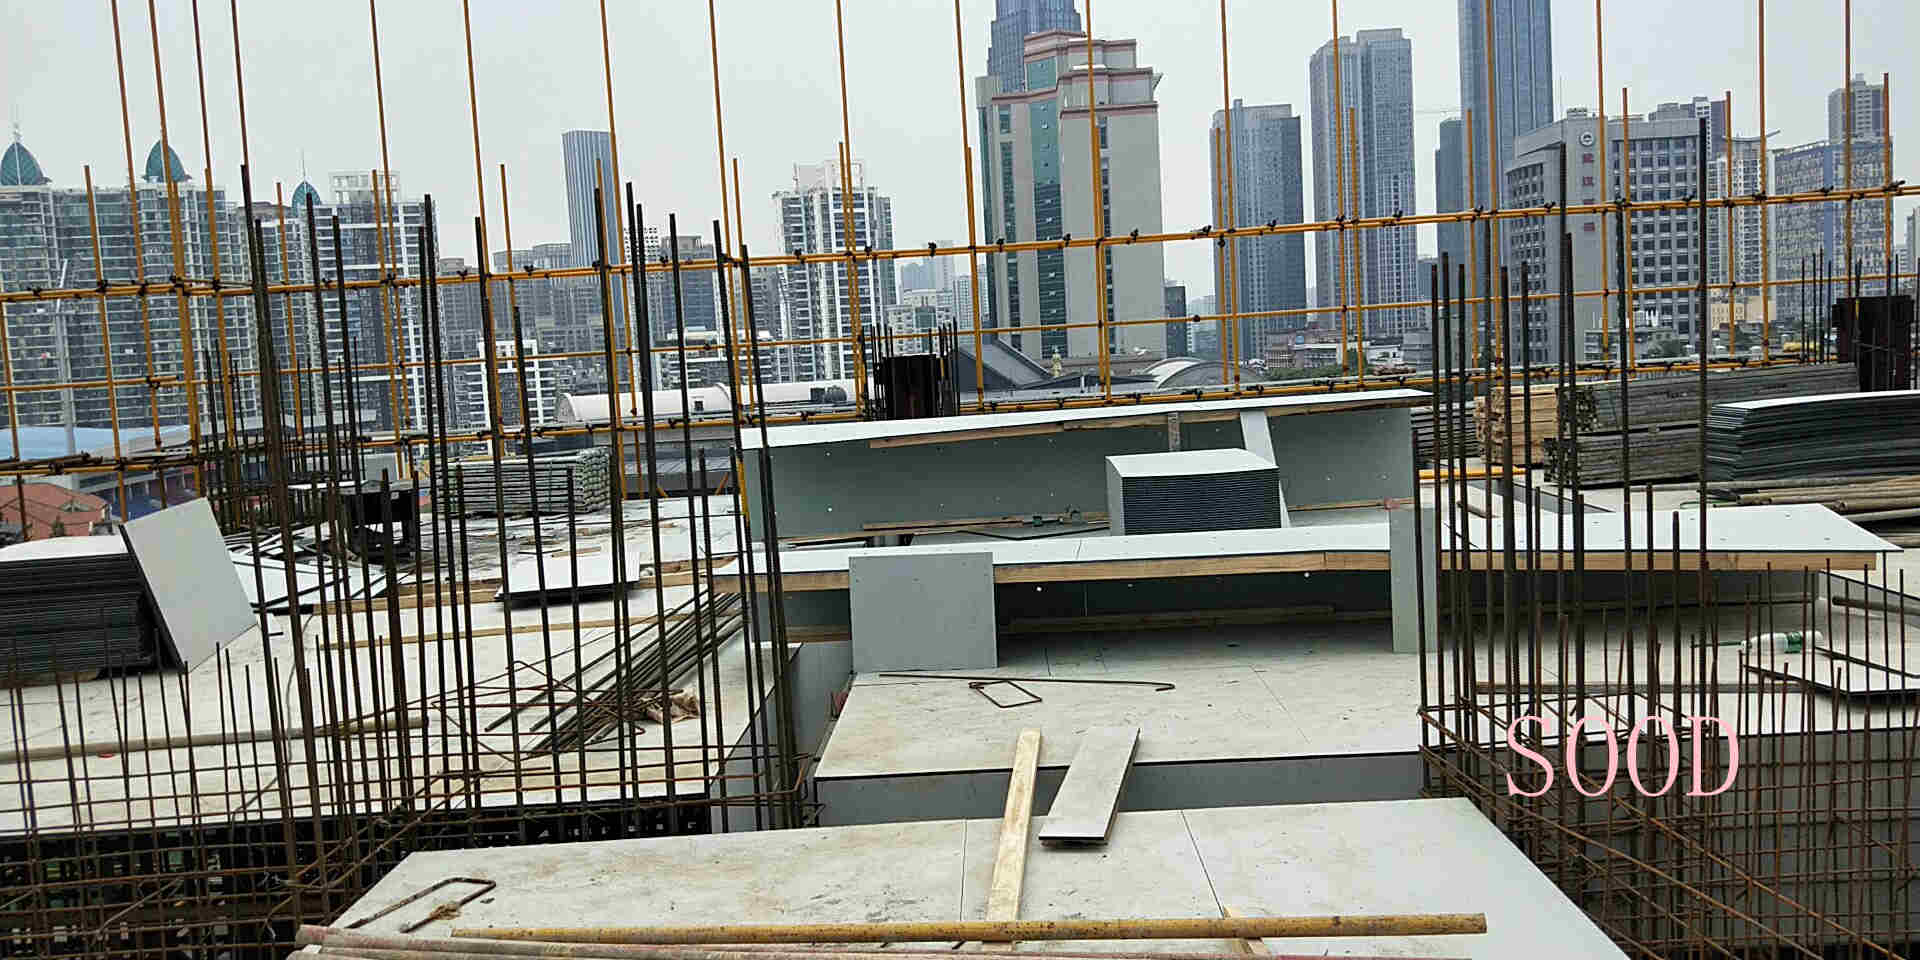 High Reuse Construction Plastic Formwork for Concrete Panel